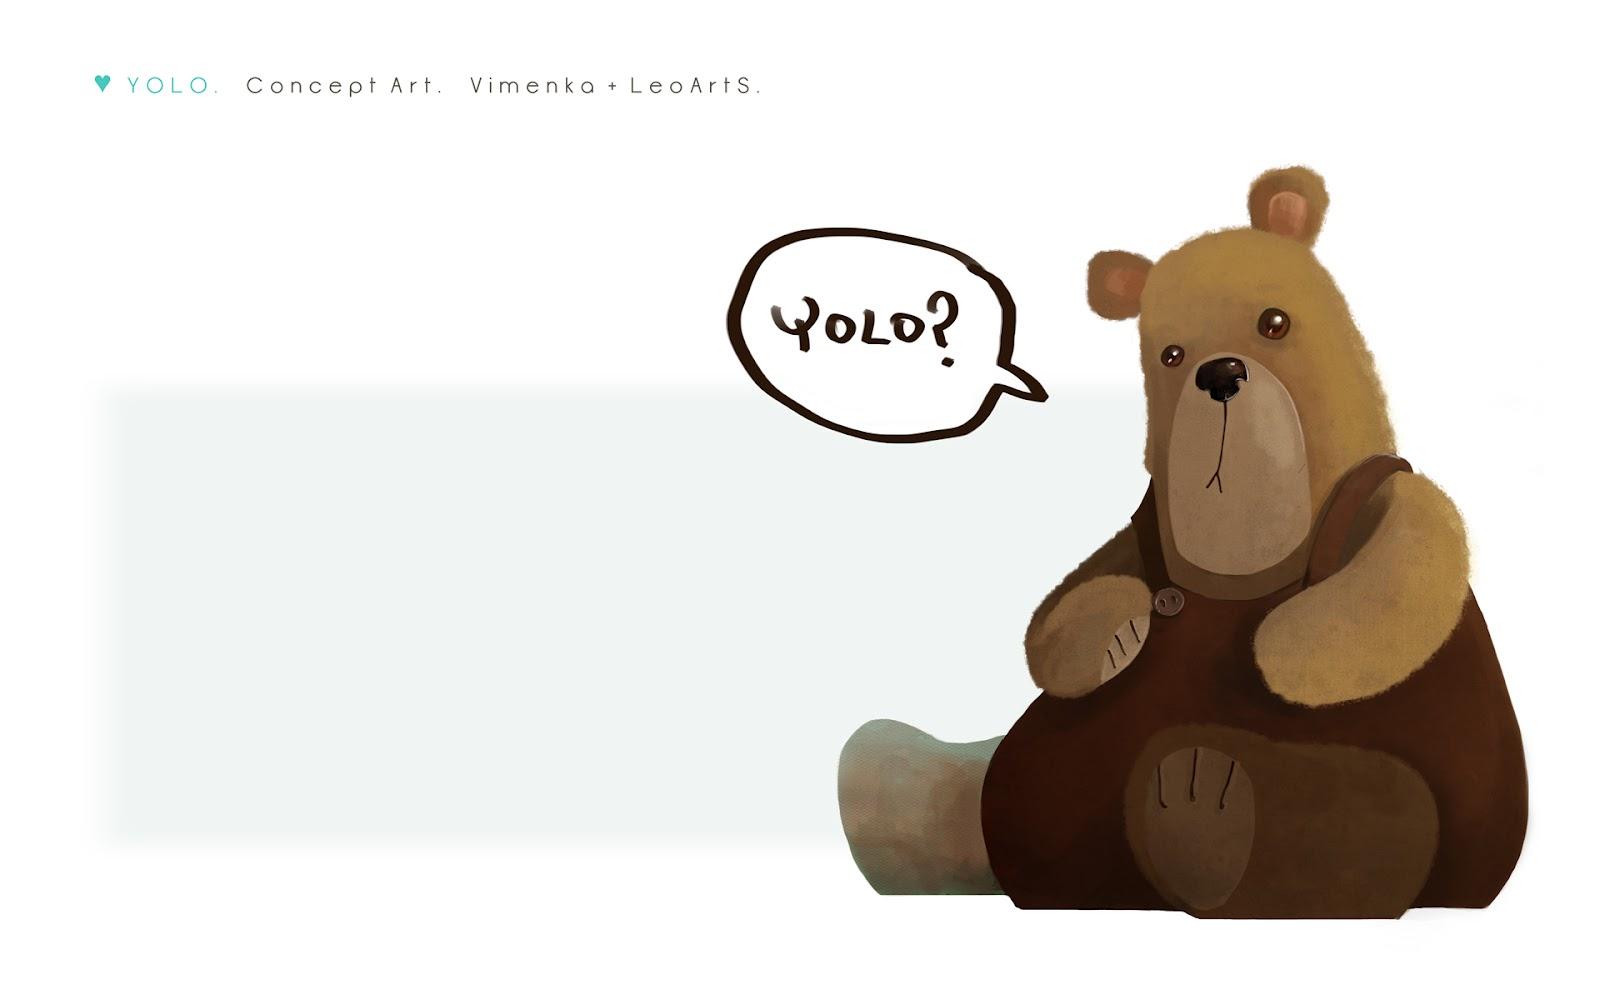 http://2.bp.blogspot.com/-gKiCmBnK6Rc/UDaLh1CpCAI/AAAAAAAAChU/p2IzGAaiZzw/s1600/yolo_leoarts_vimenka_bear.jpg